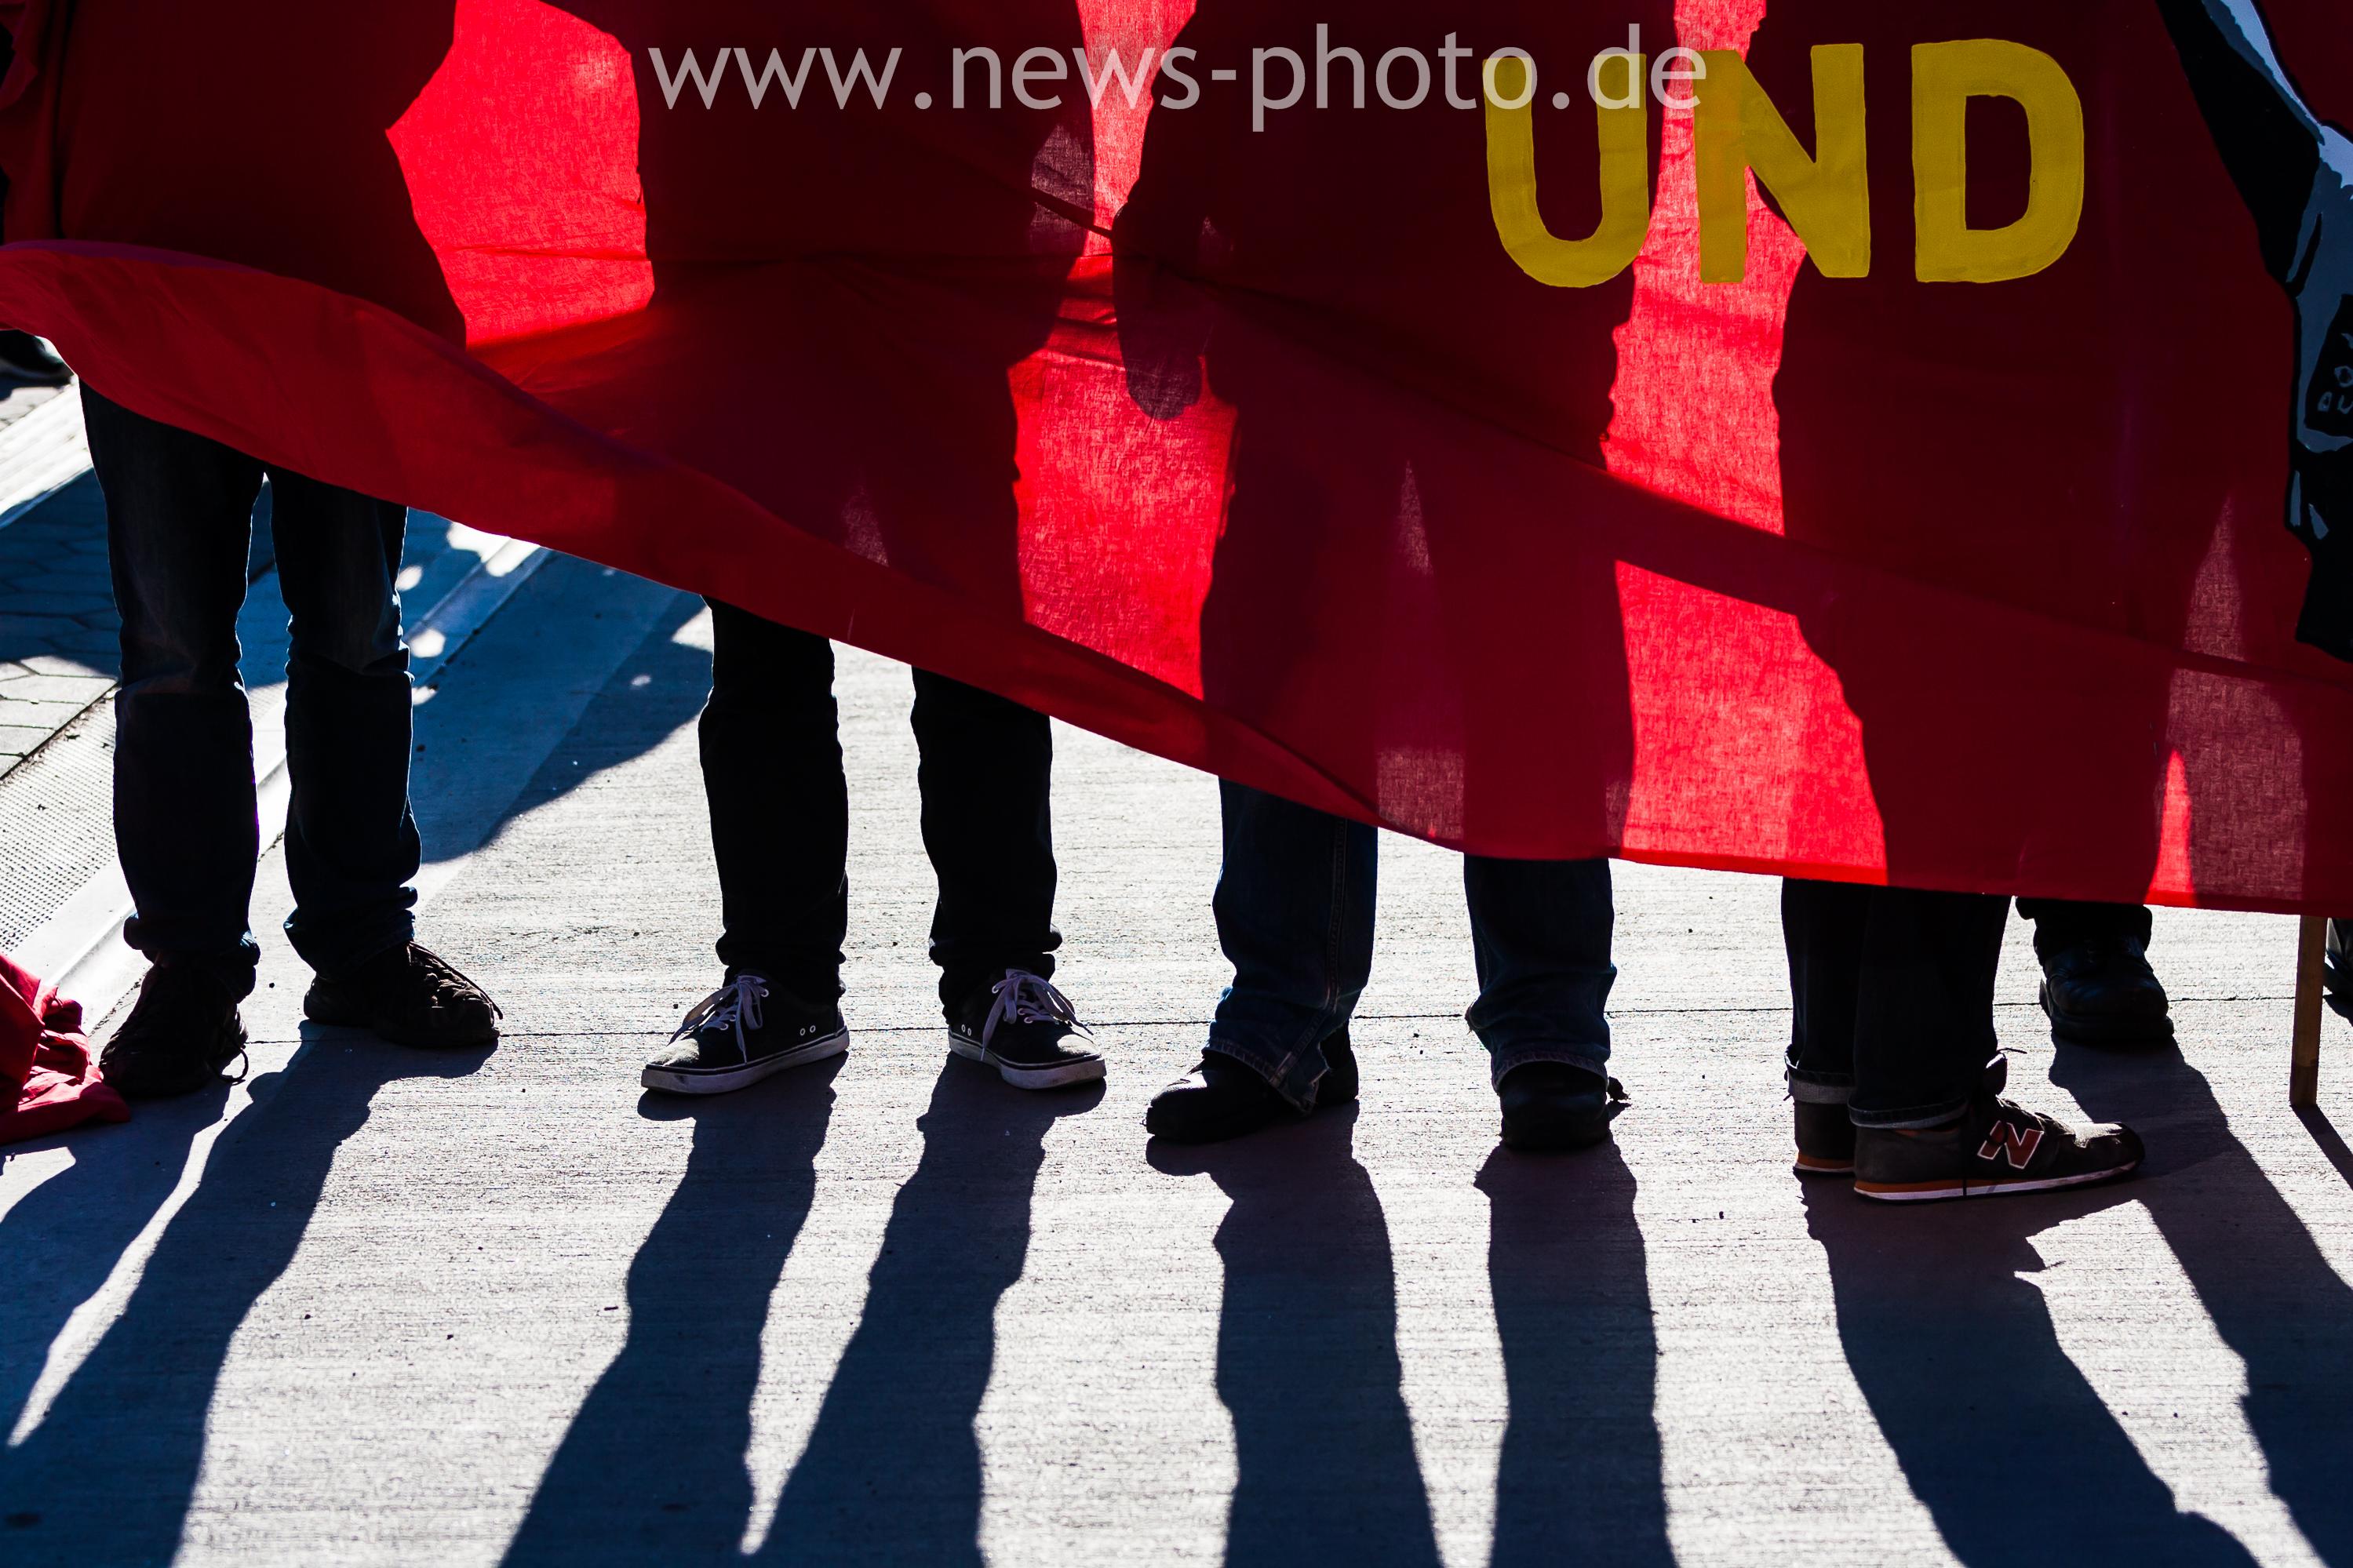 Revolutionäre 1. Mai Demonstration